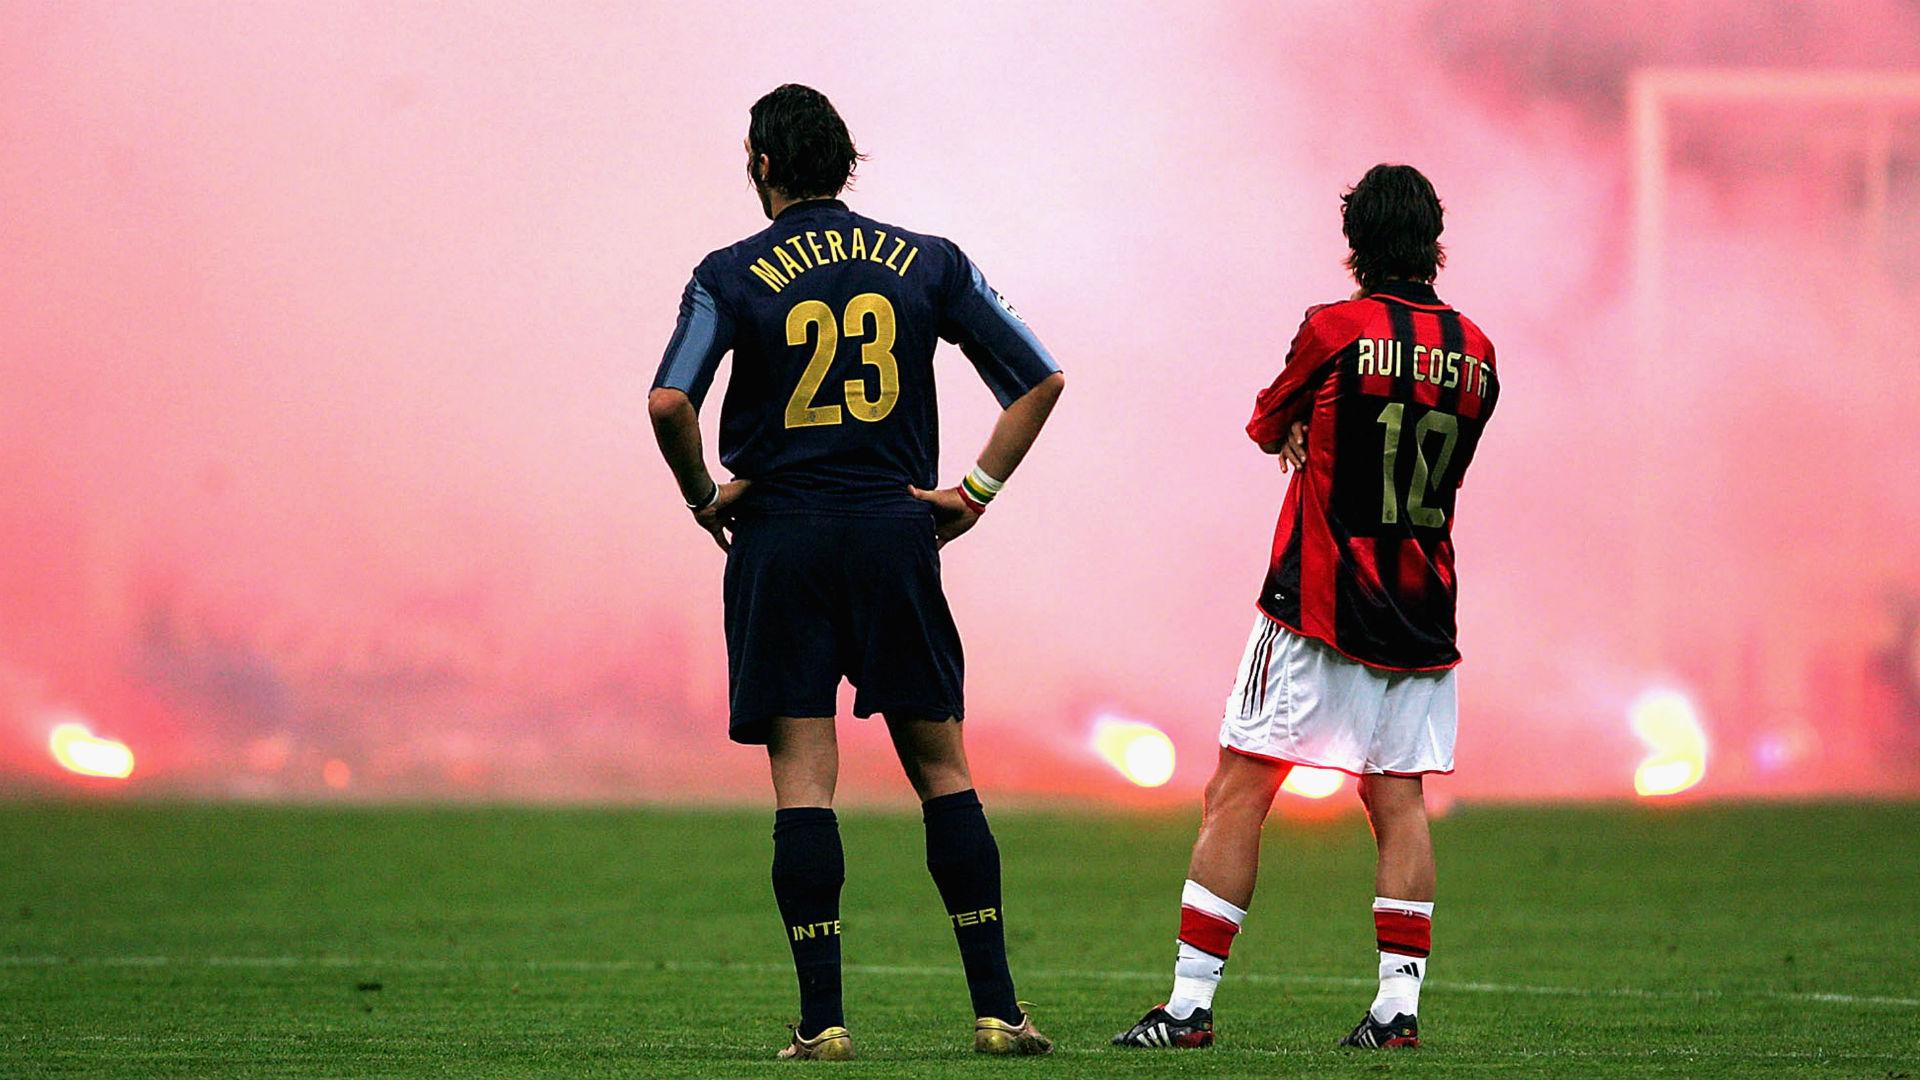 Marco Materazzi Rui Costa Inter Milan 2015